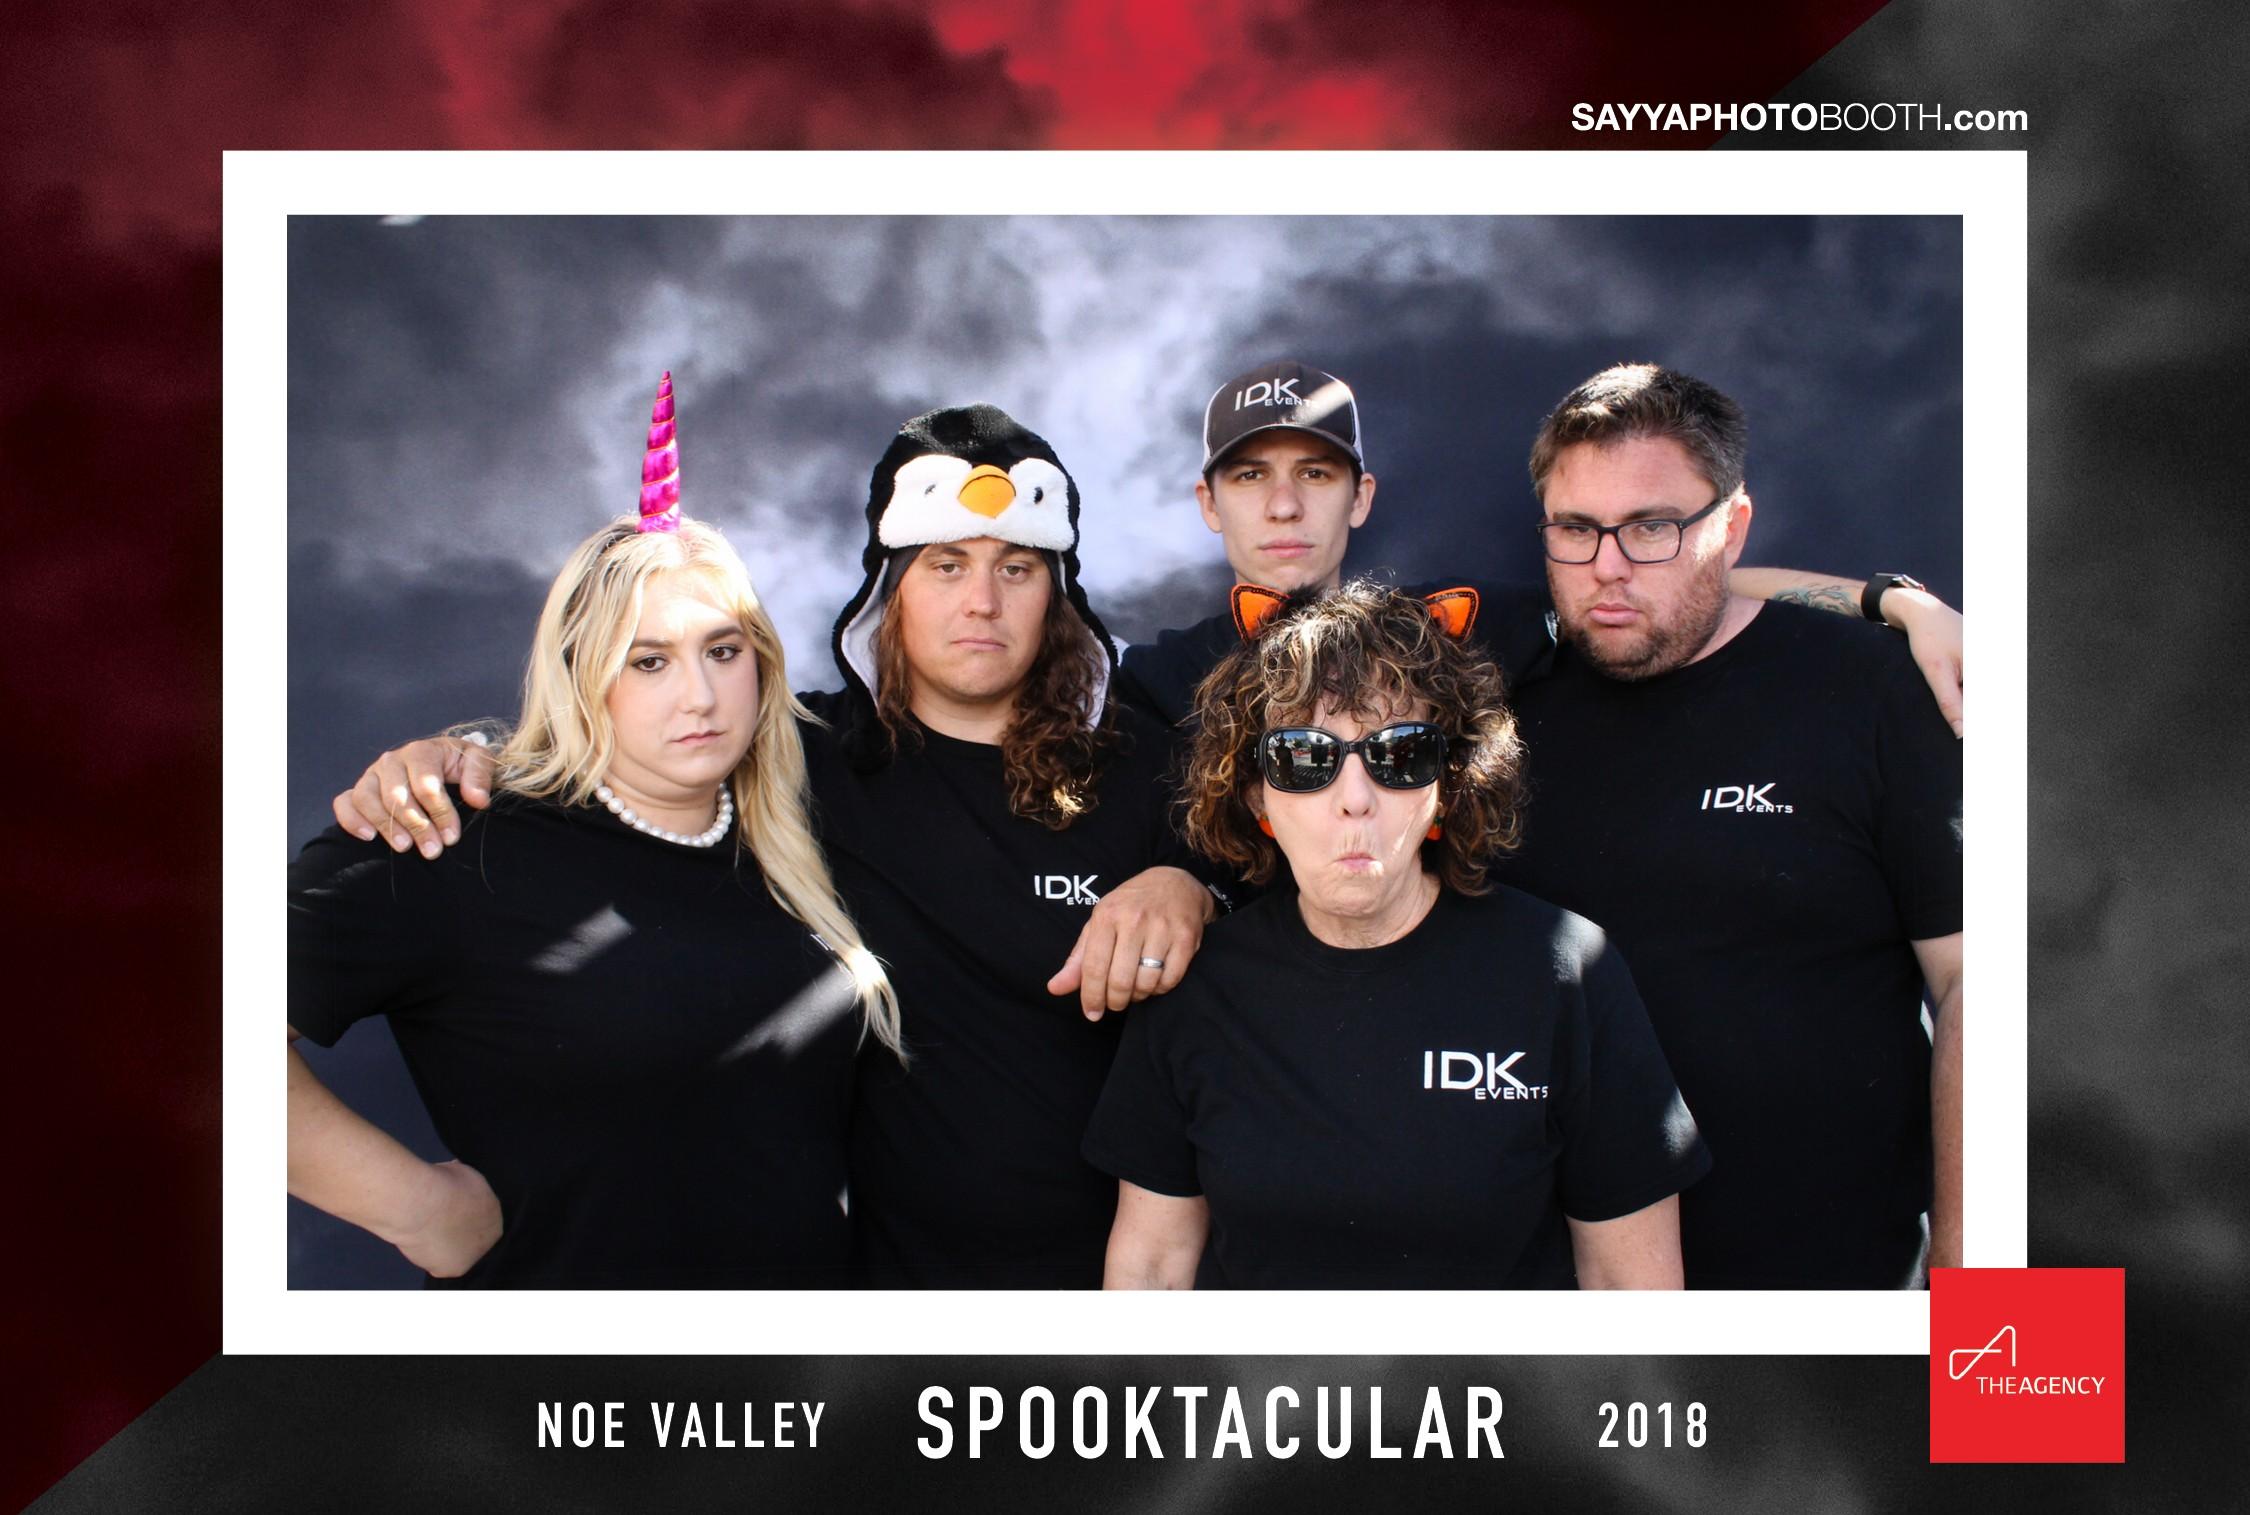 Noe Valley Spooktacular